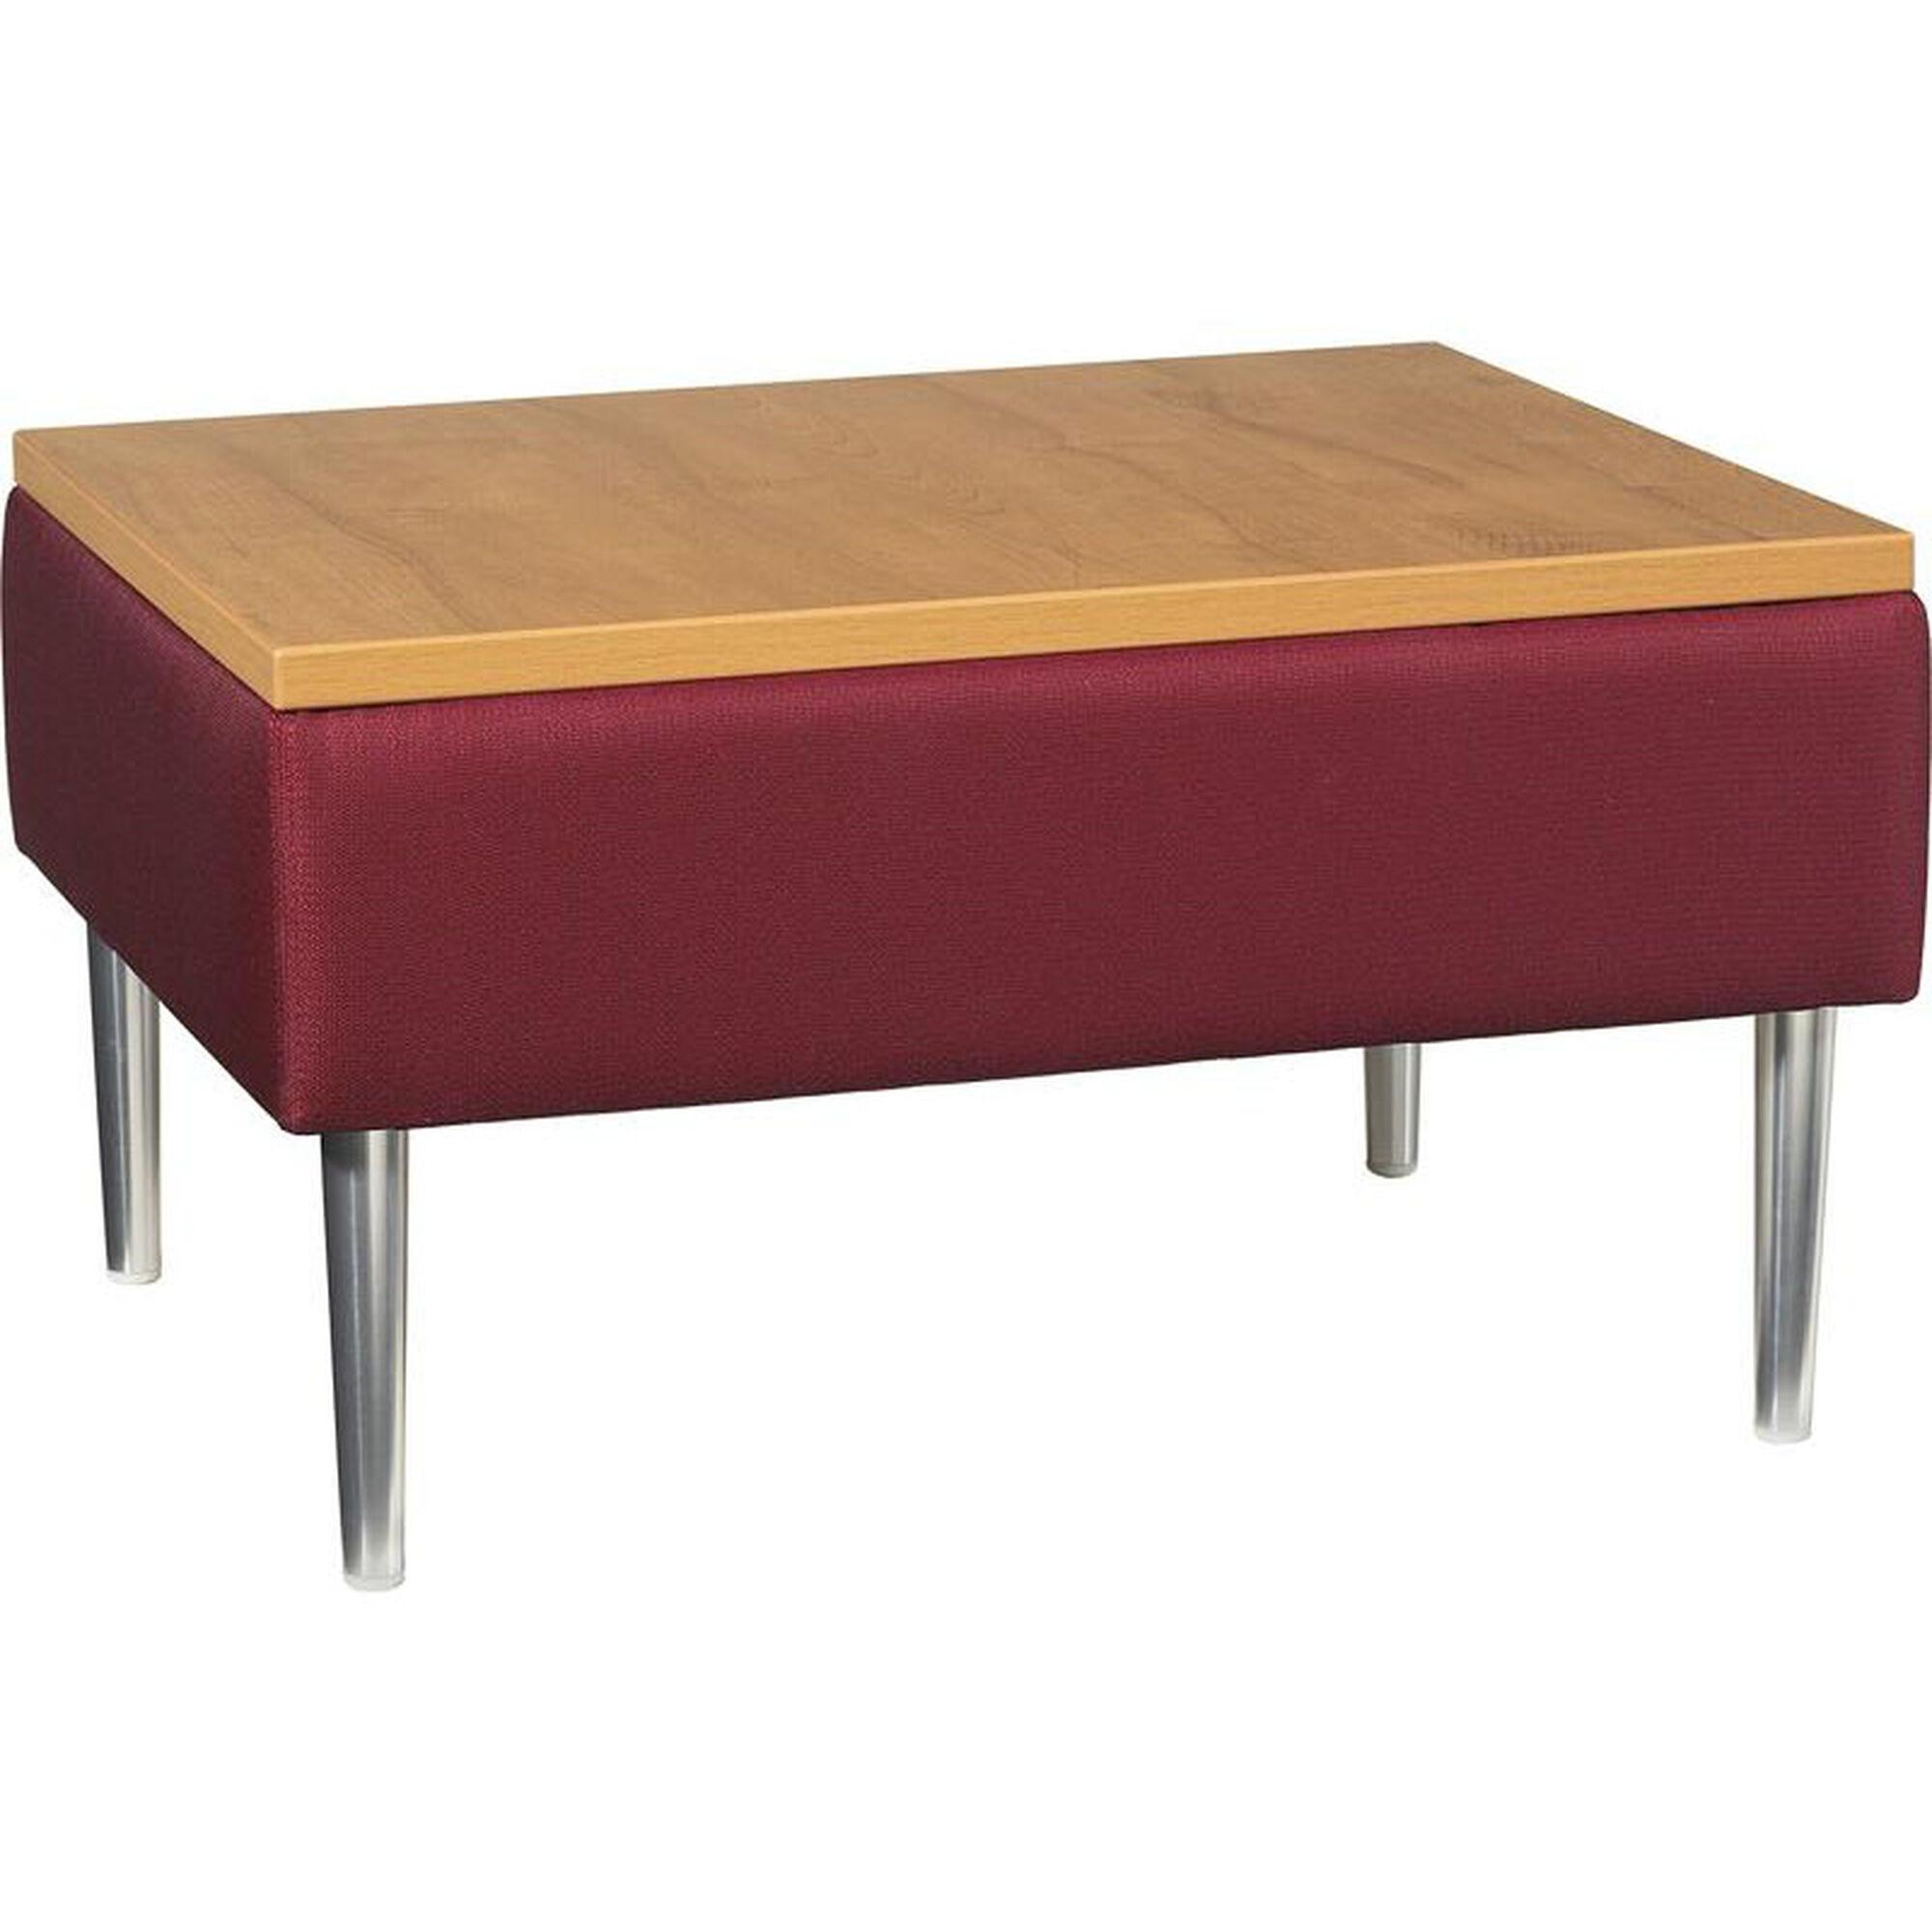 High Point Furniture Industries 5823 Hpf 5823